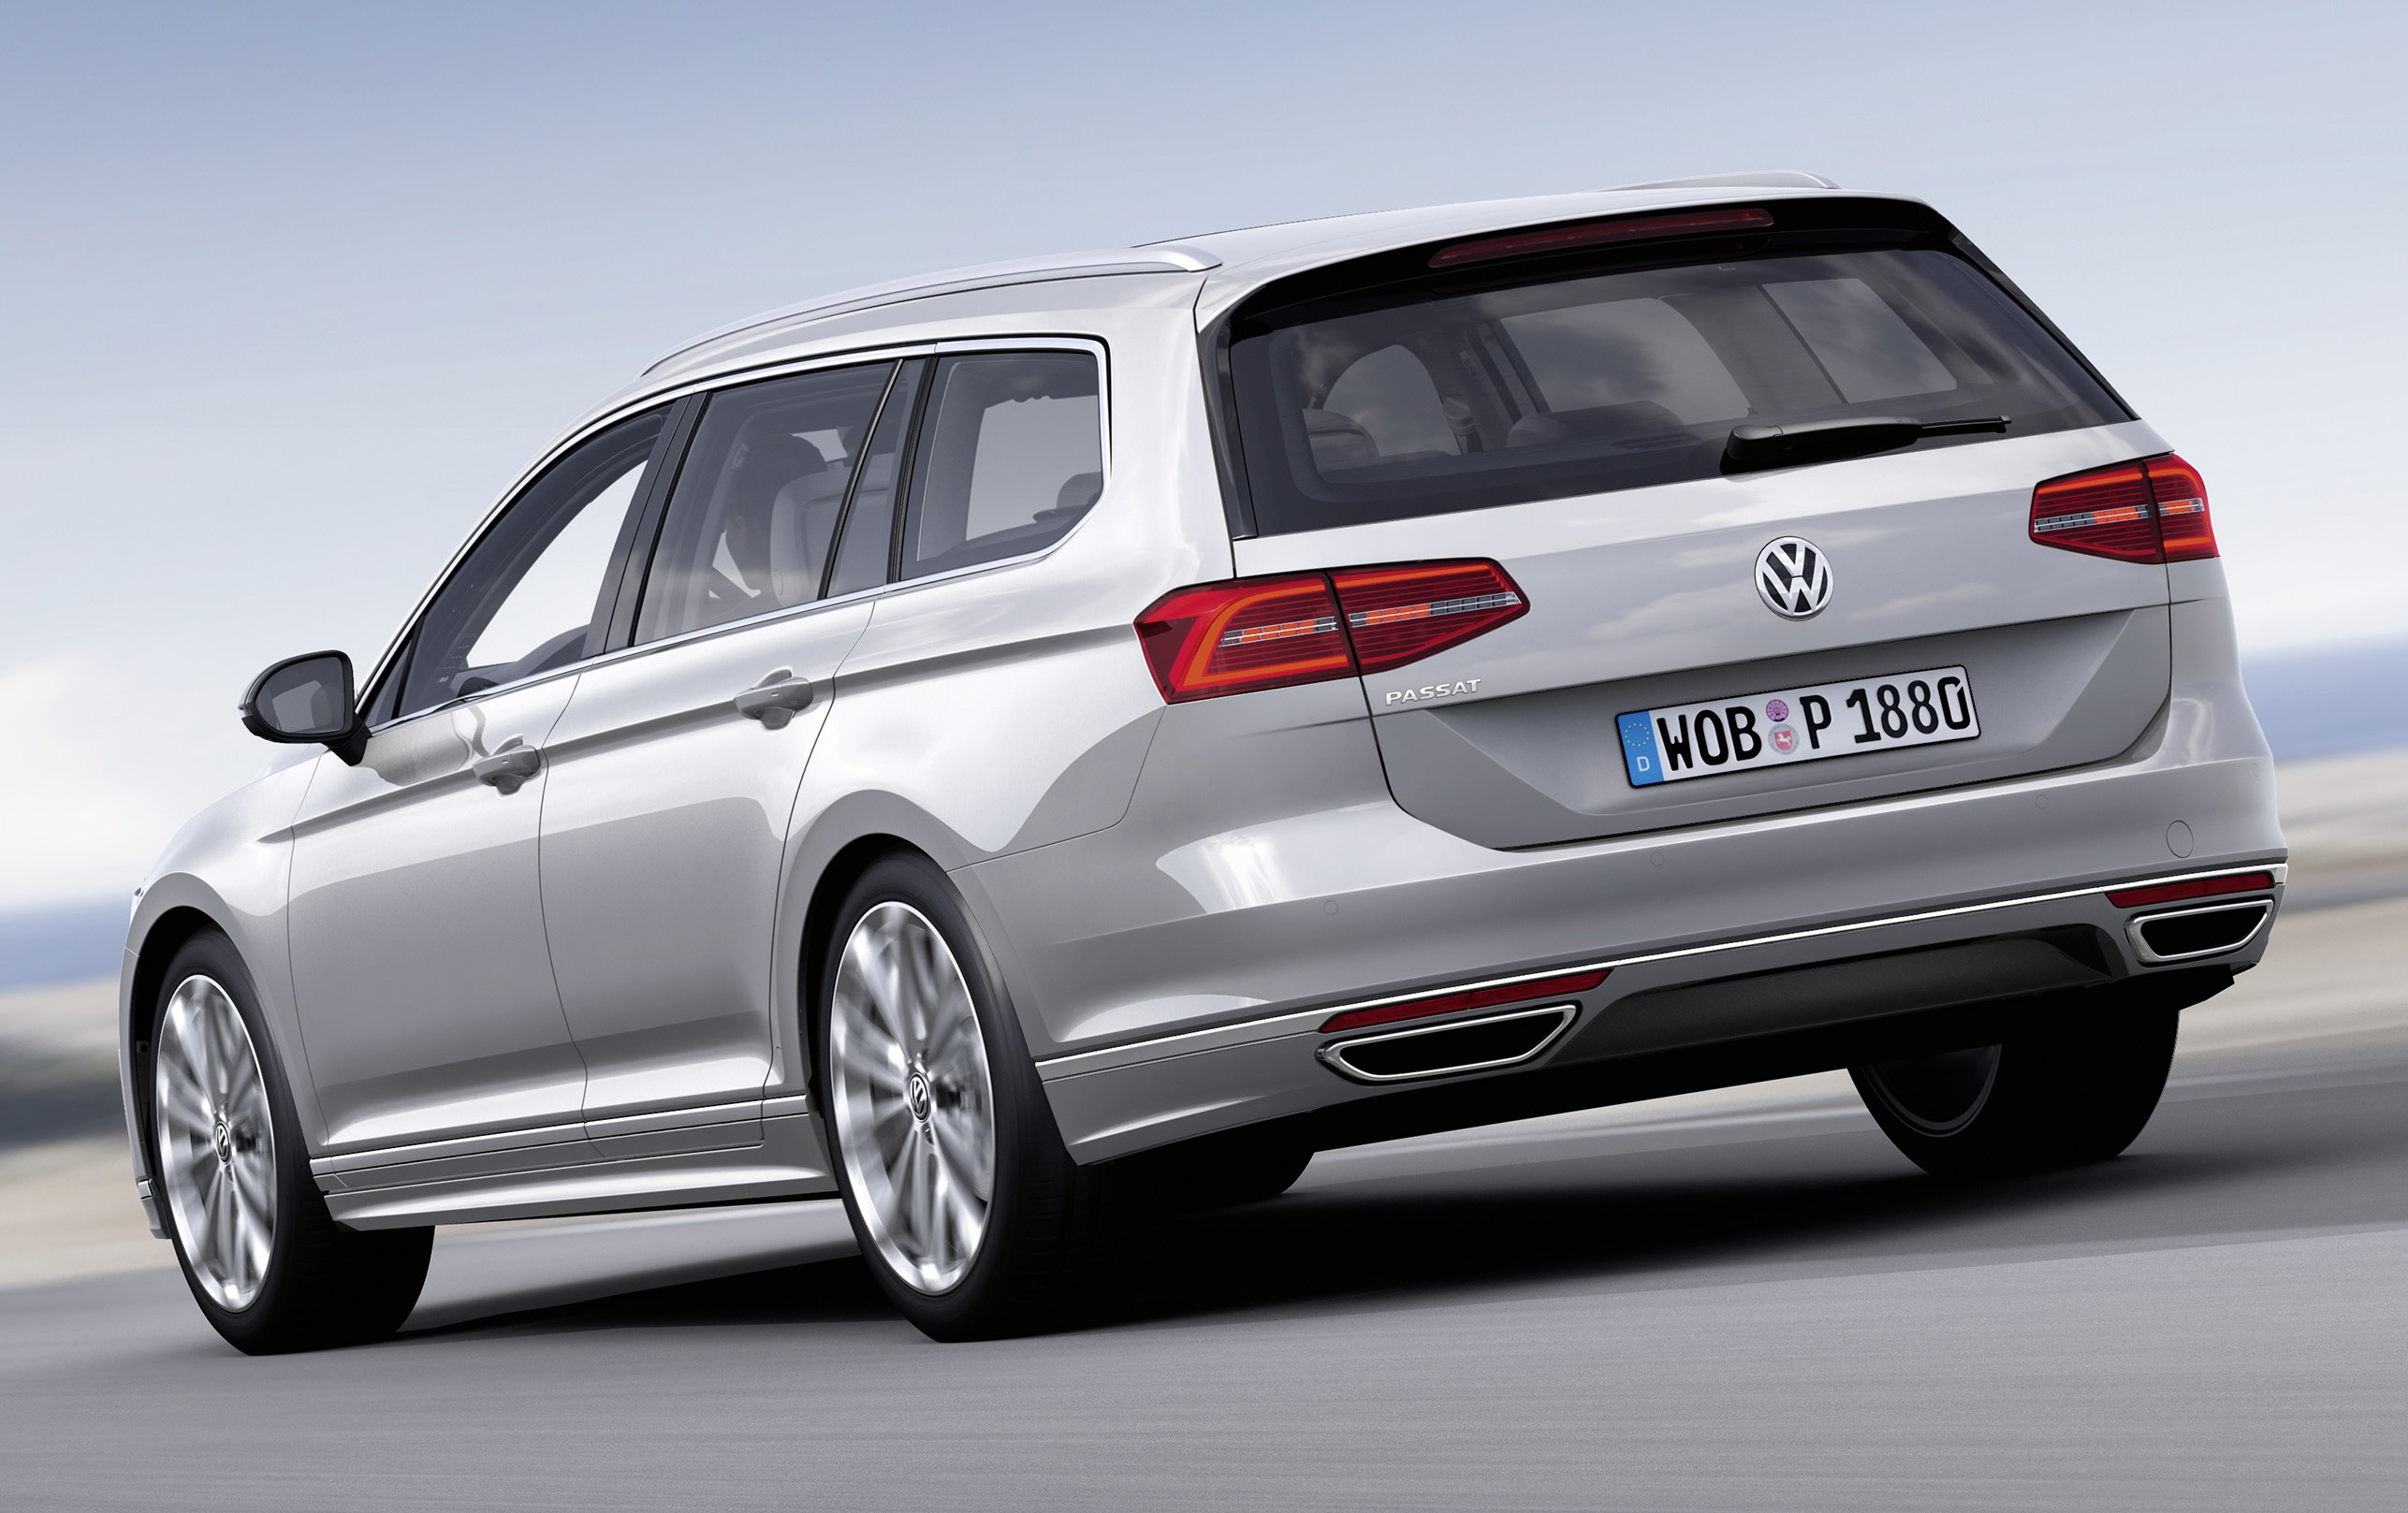 2015 Volkswagen Passat B8 Full Details Amp Photos Image 256964